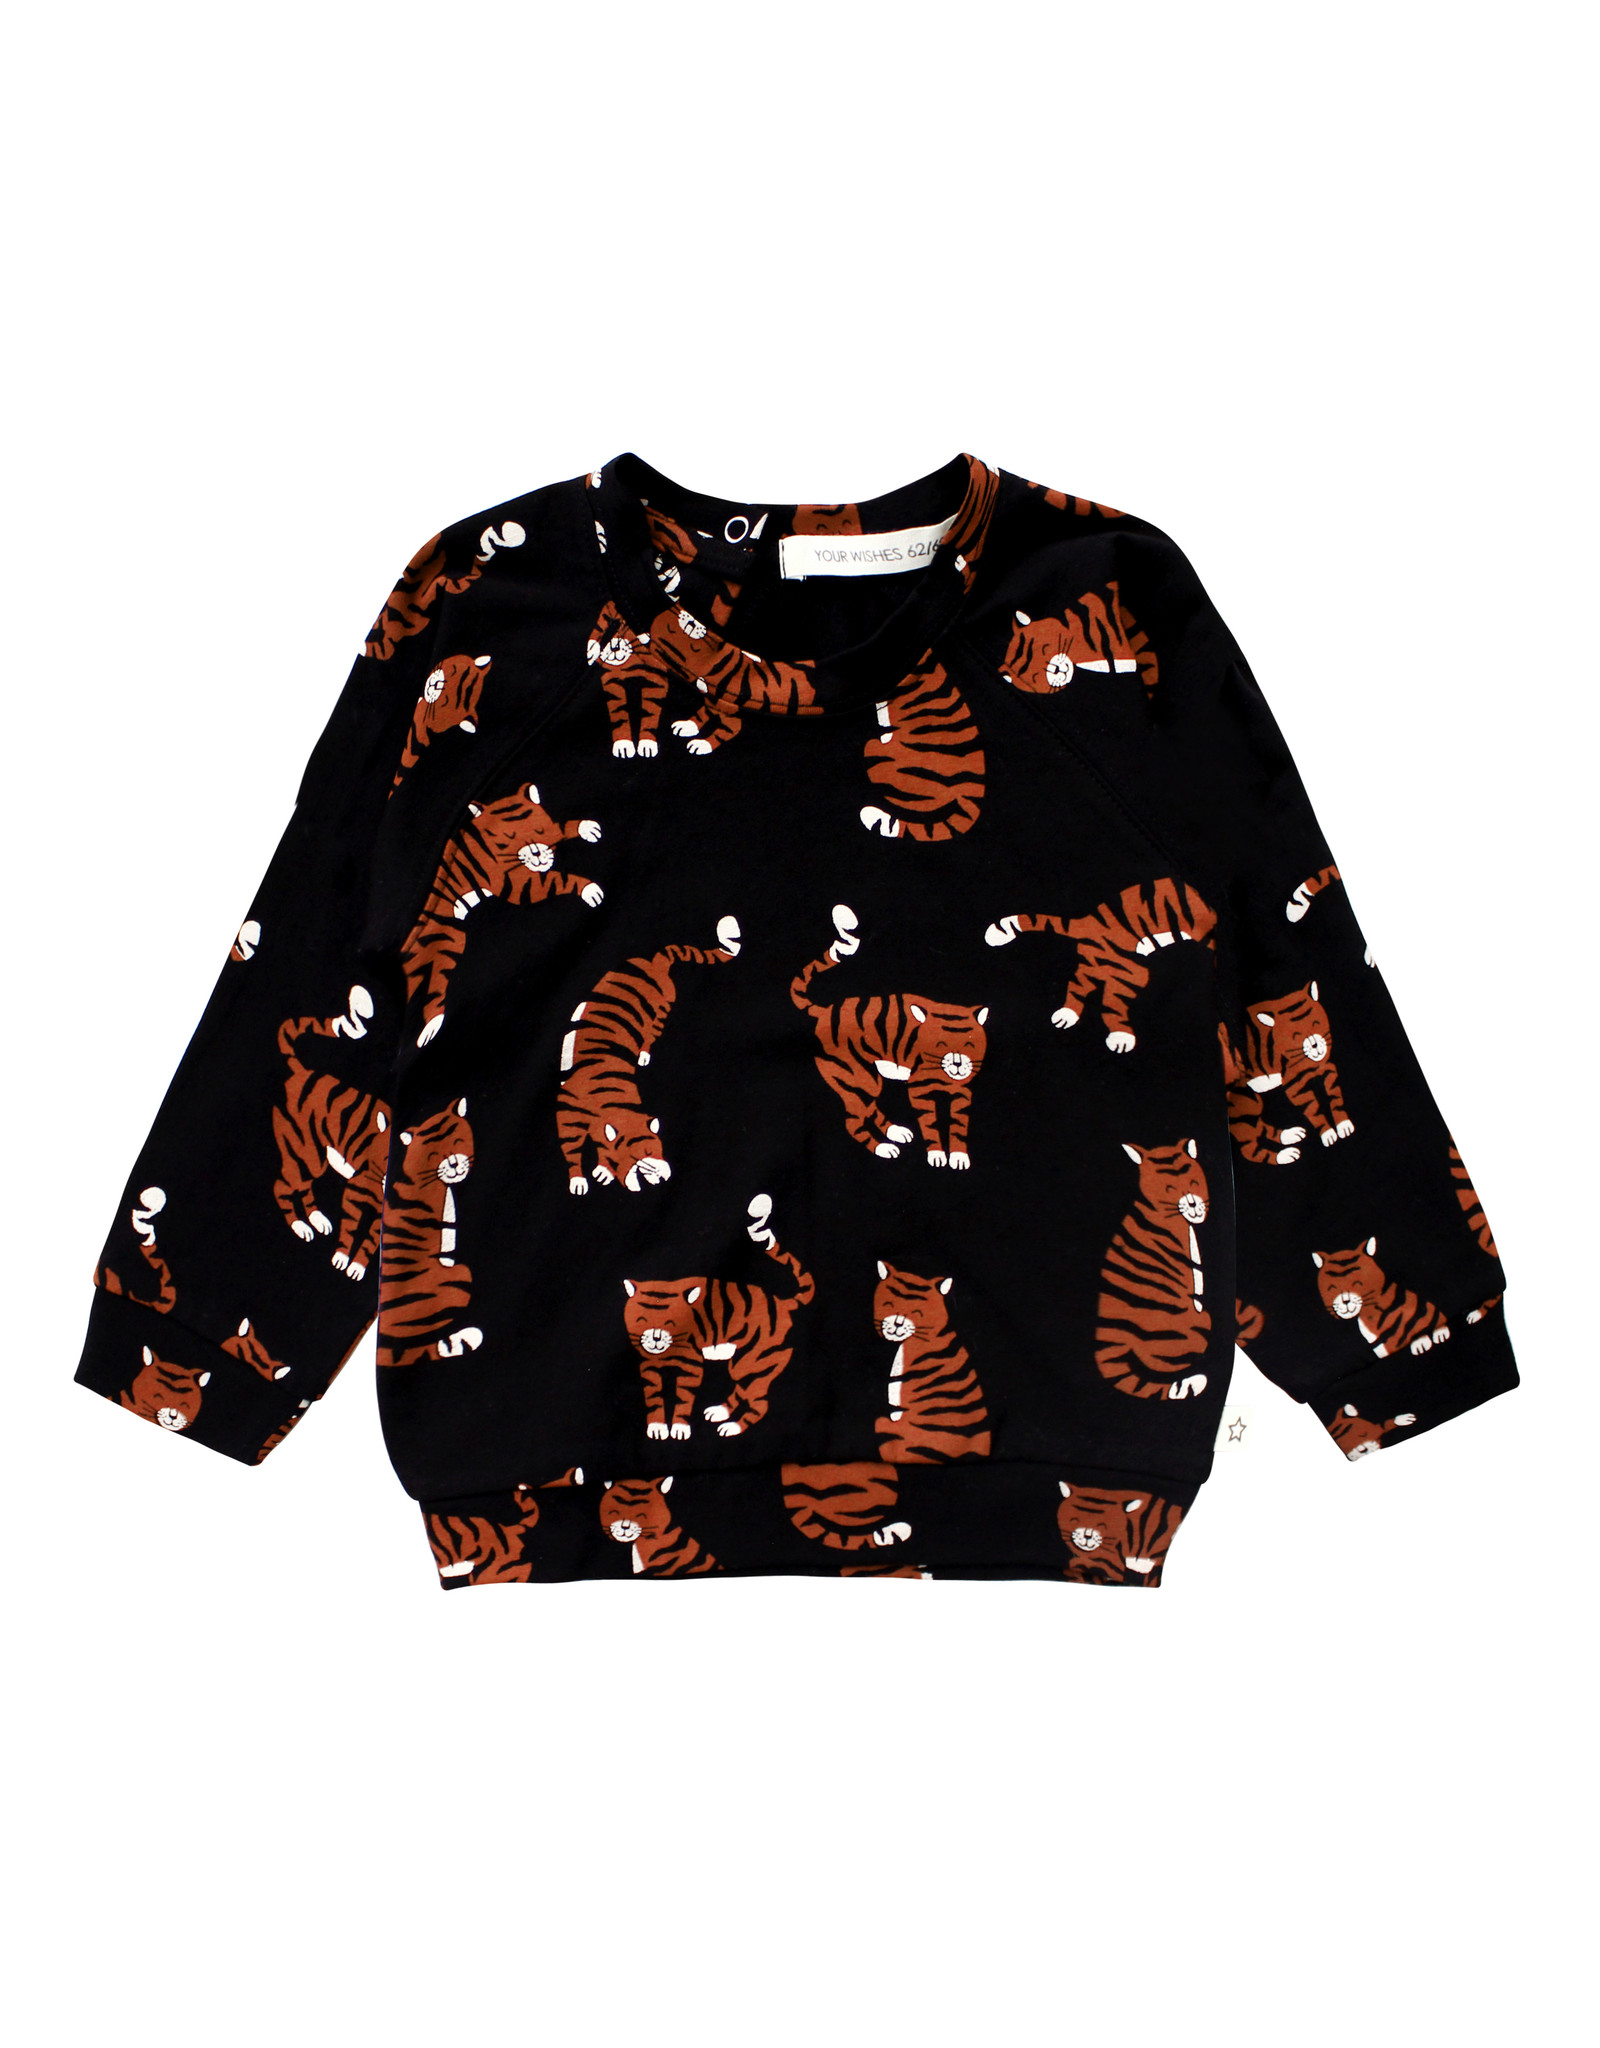 Your Wishes Tigers | Sweatshirt, Black